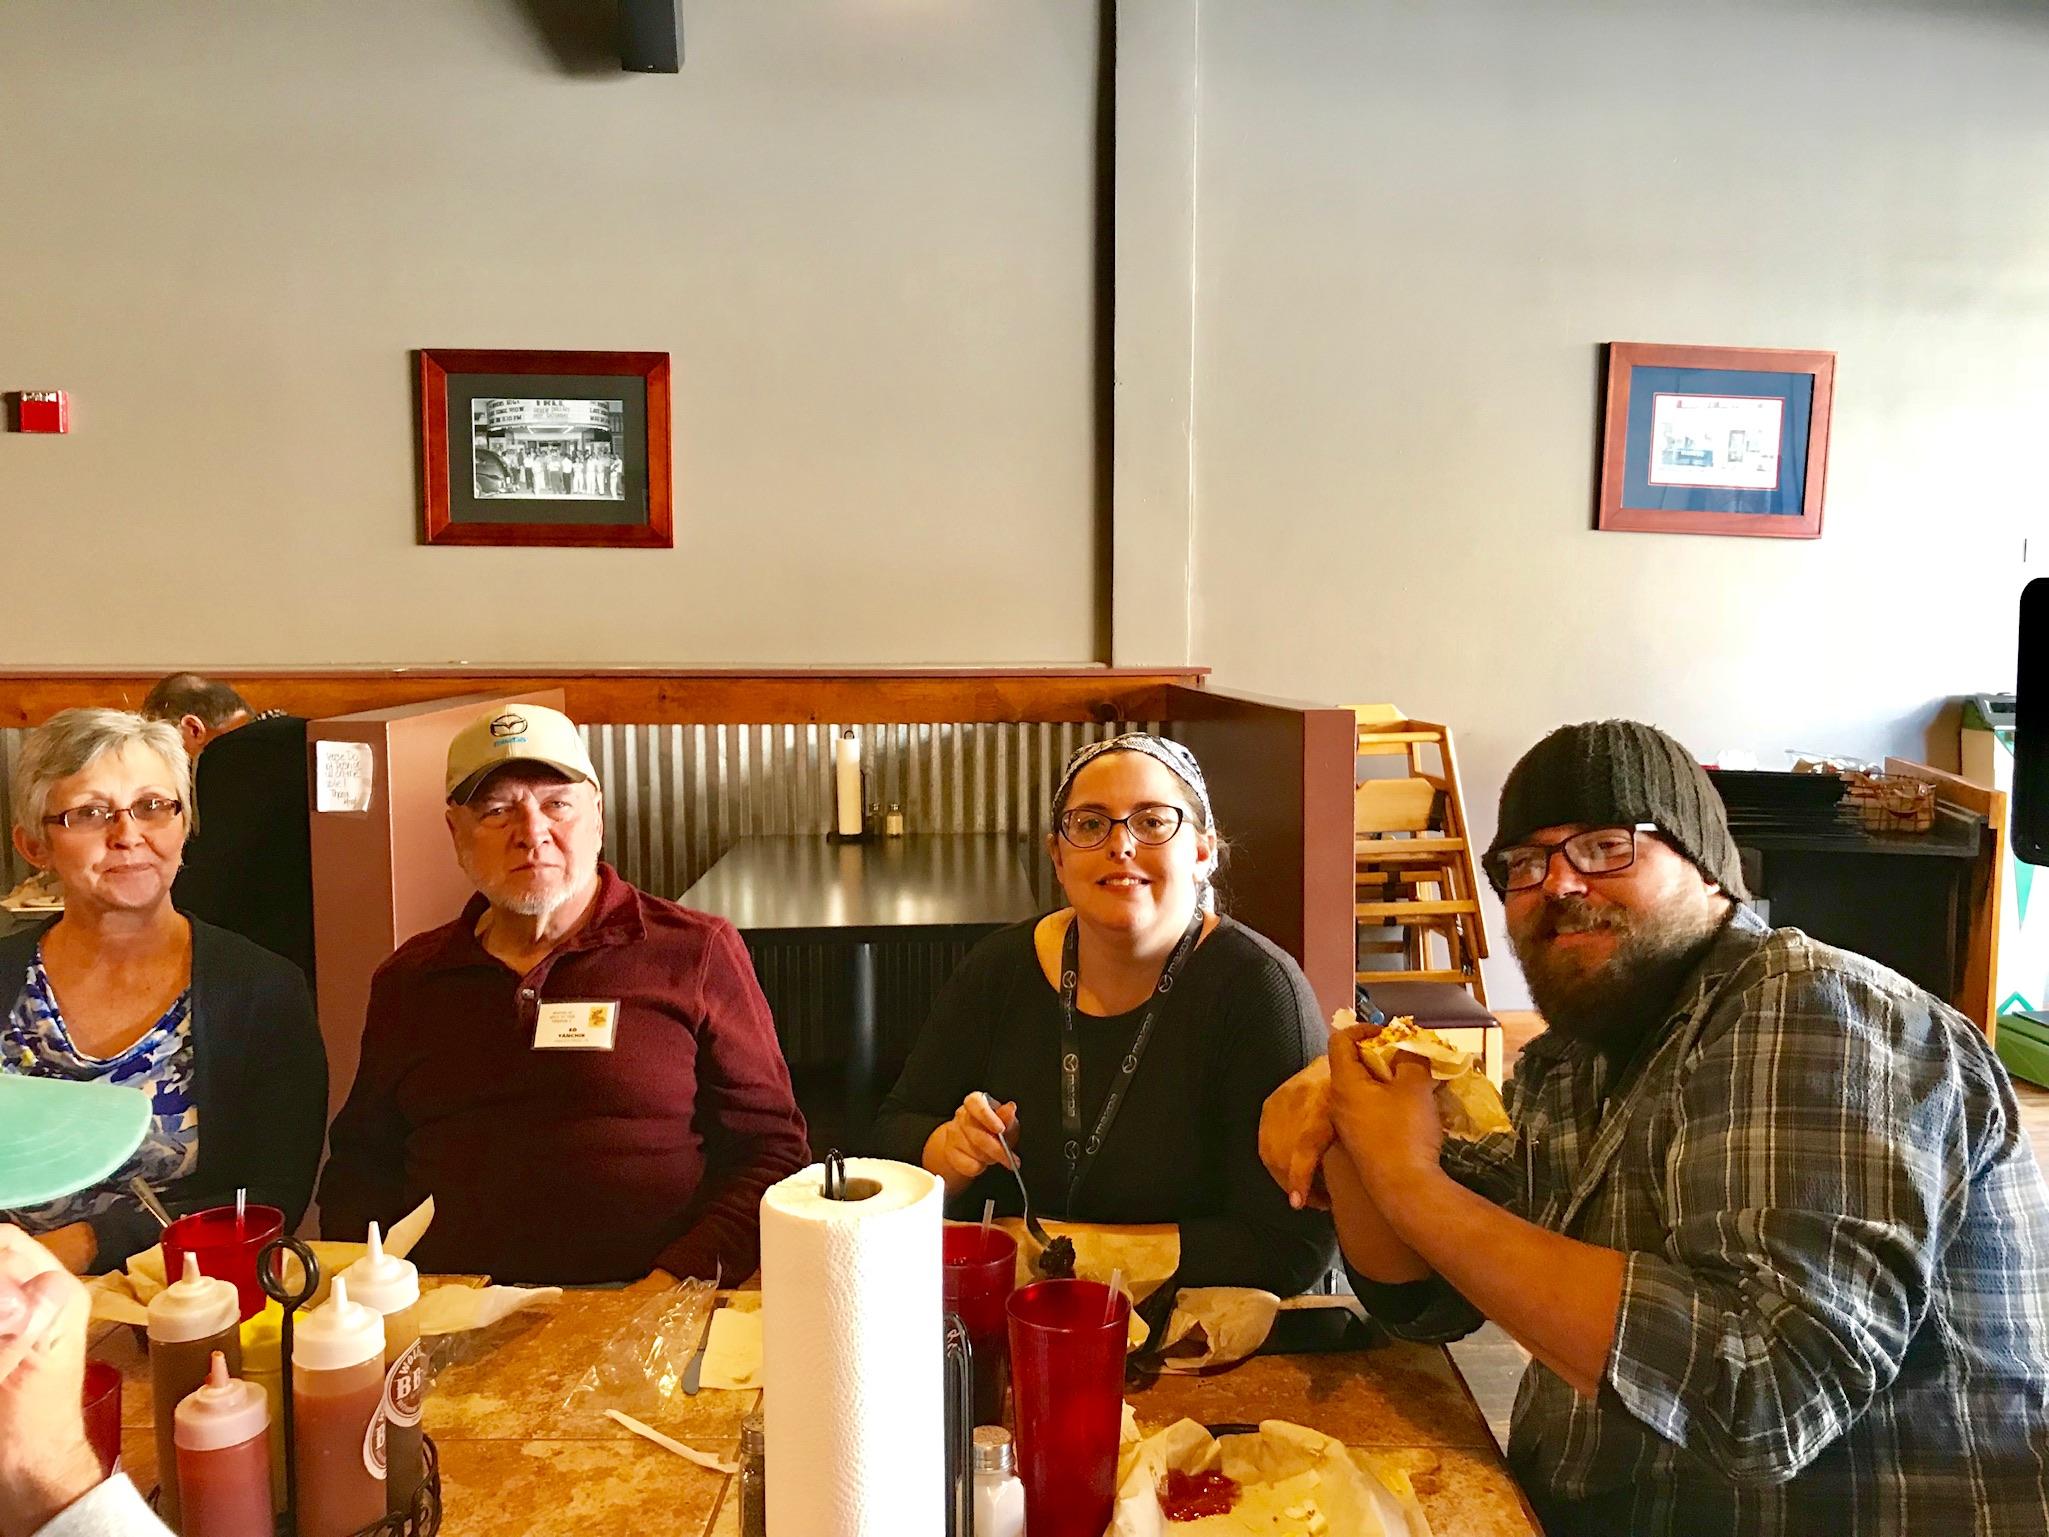 Lunch at Wolfe's BBQ. From left: Patsy Yanchik, Ed Yanchik, Krystal Williams, Josh Williams.